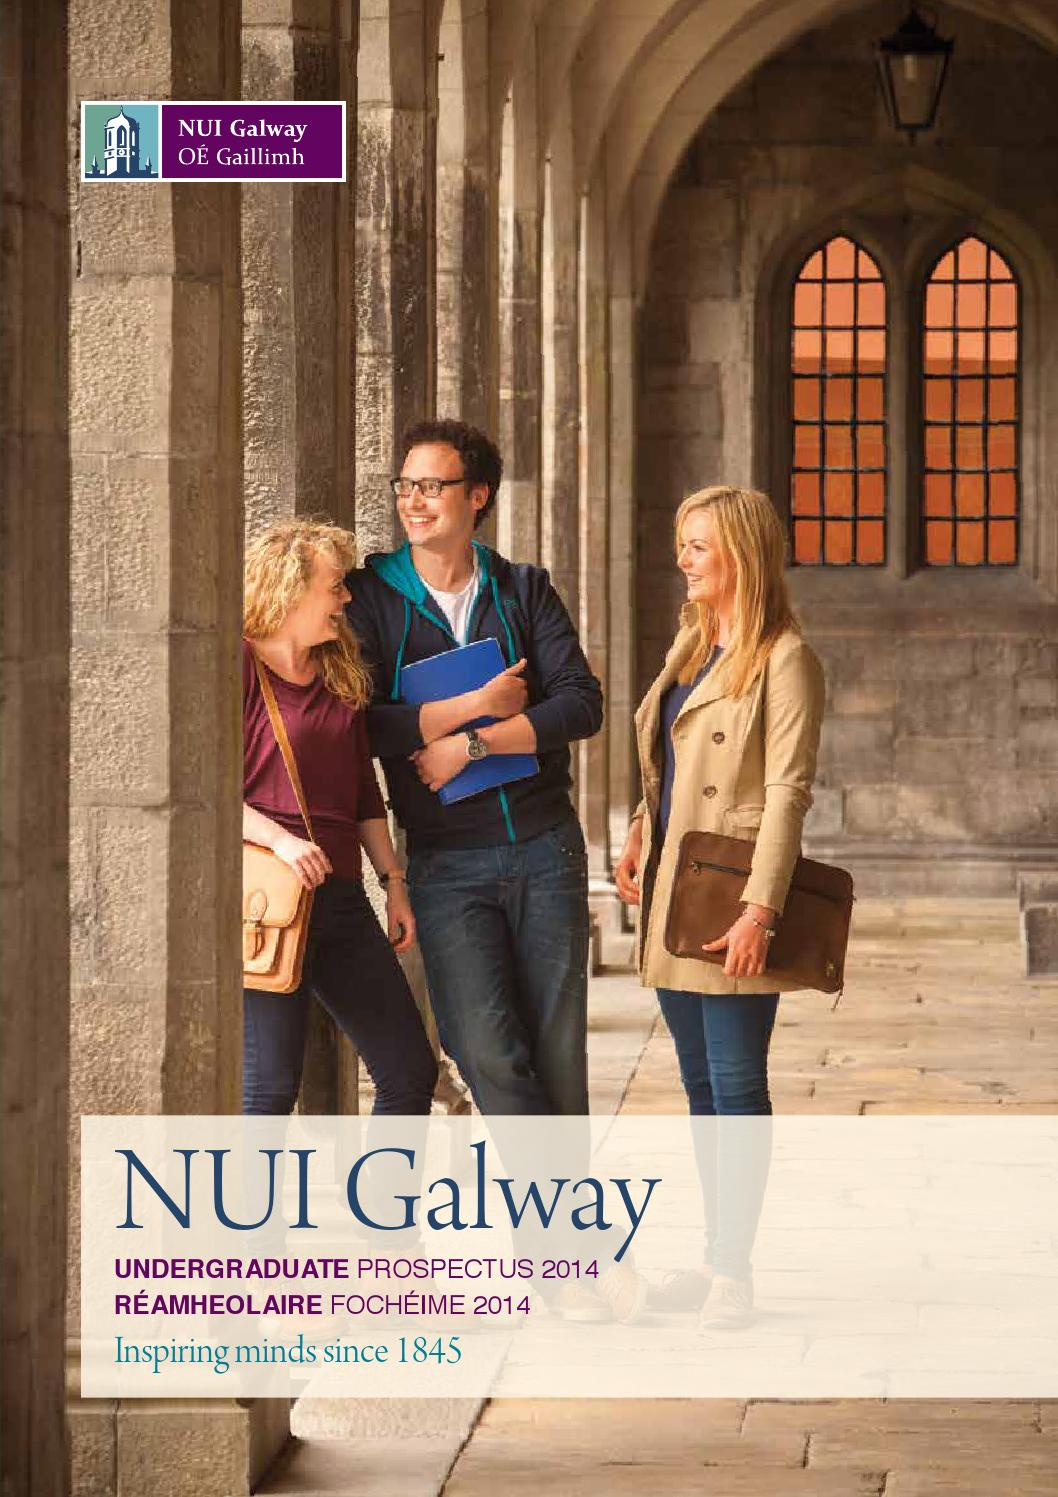 2014 Nui Galway Undergraduate Prospectus By Je Cairnes School Of Business Economics Issuu